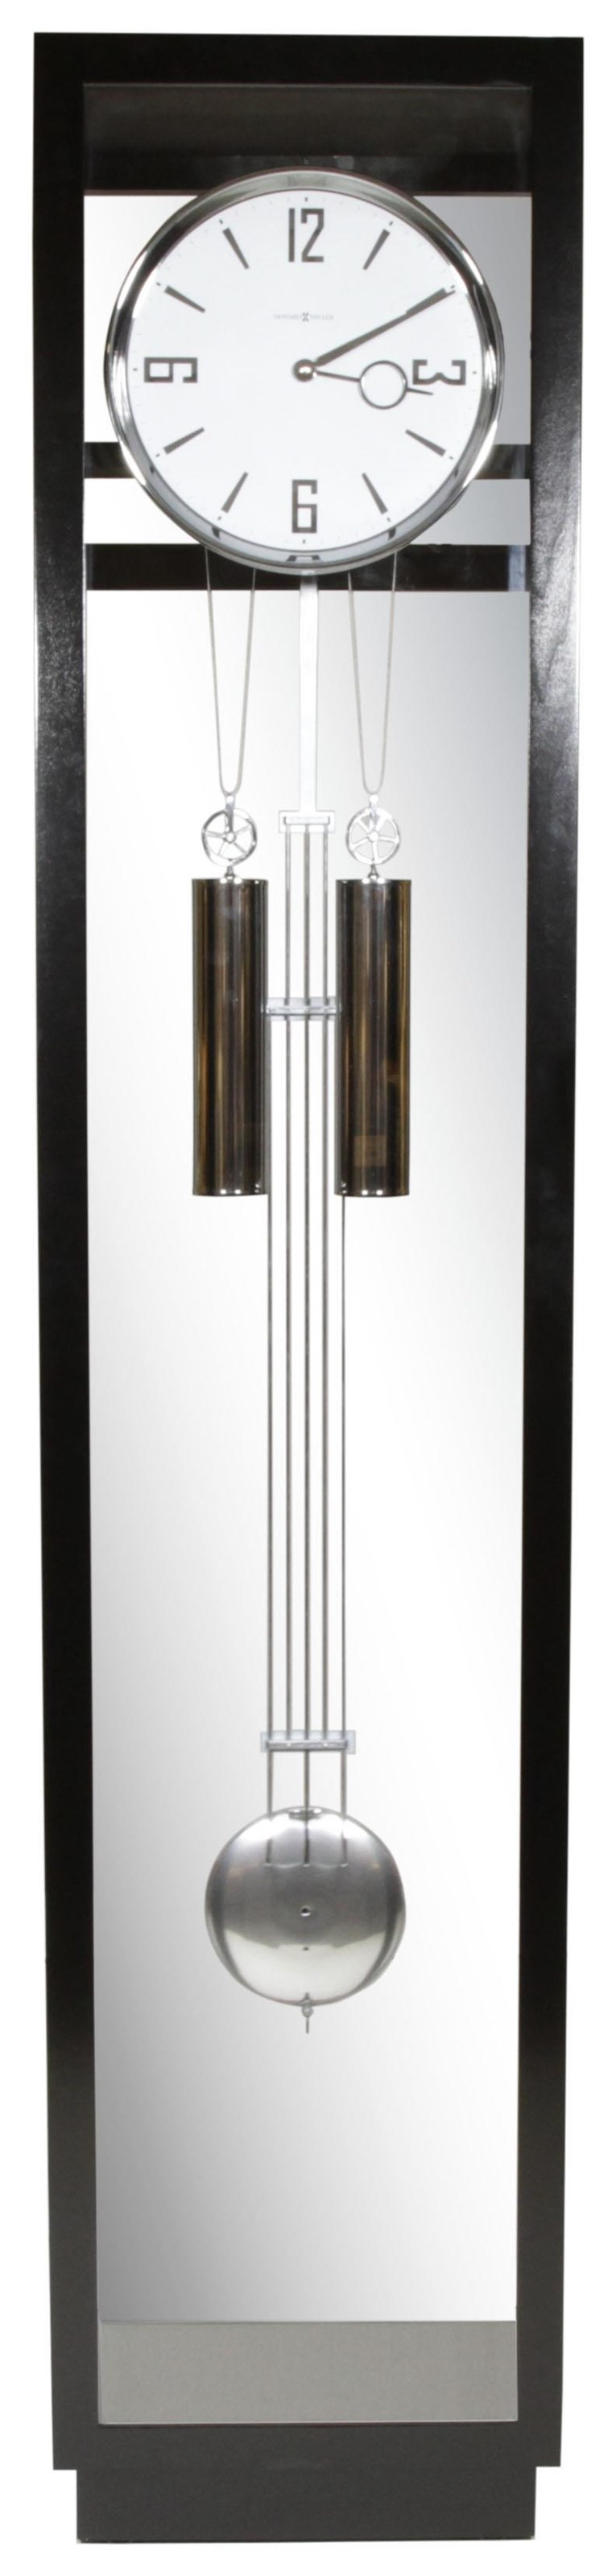 Whitelock II Floor Clock by Howard Miller at HomeWorld Furniture